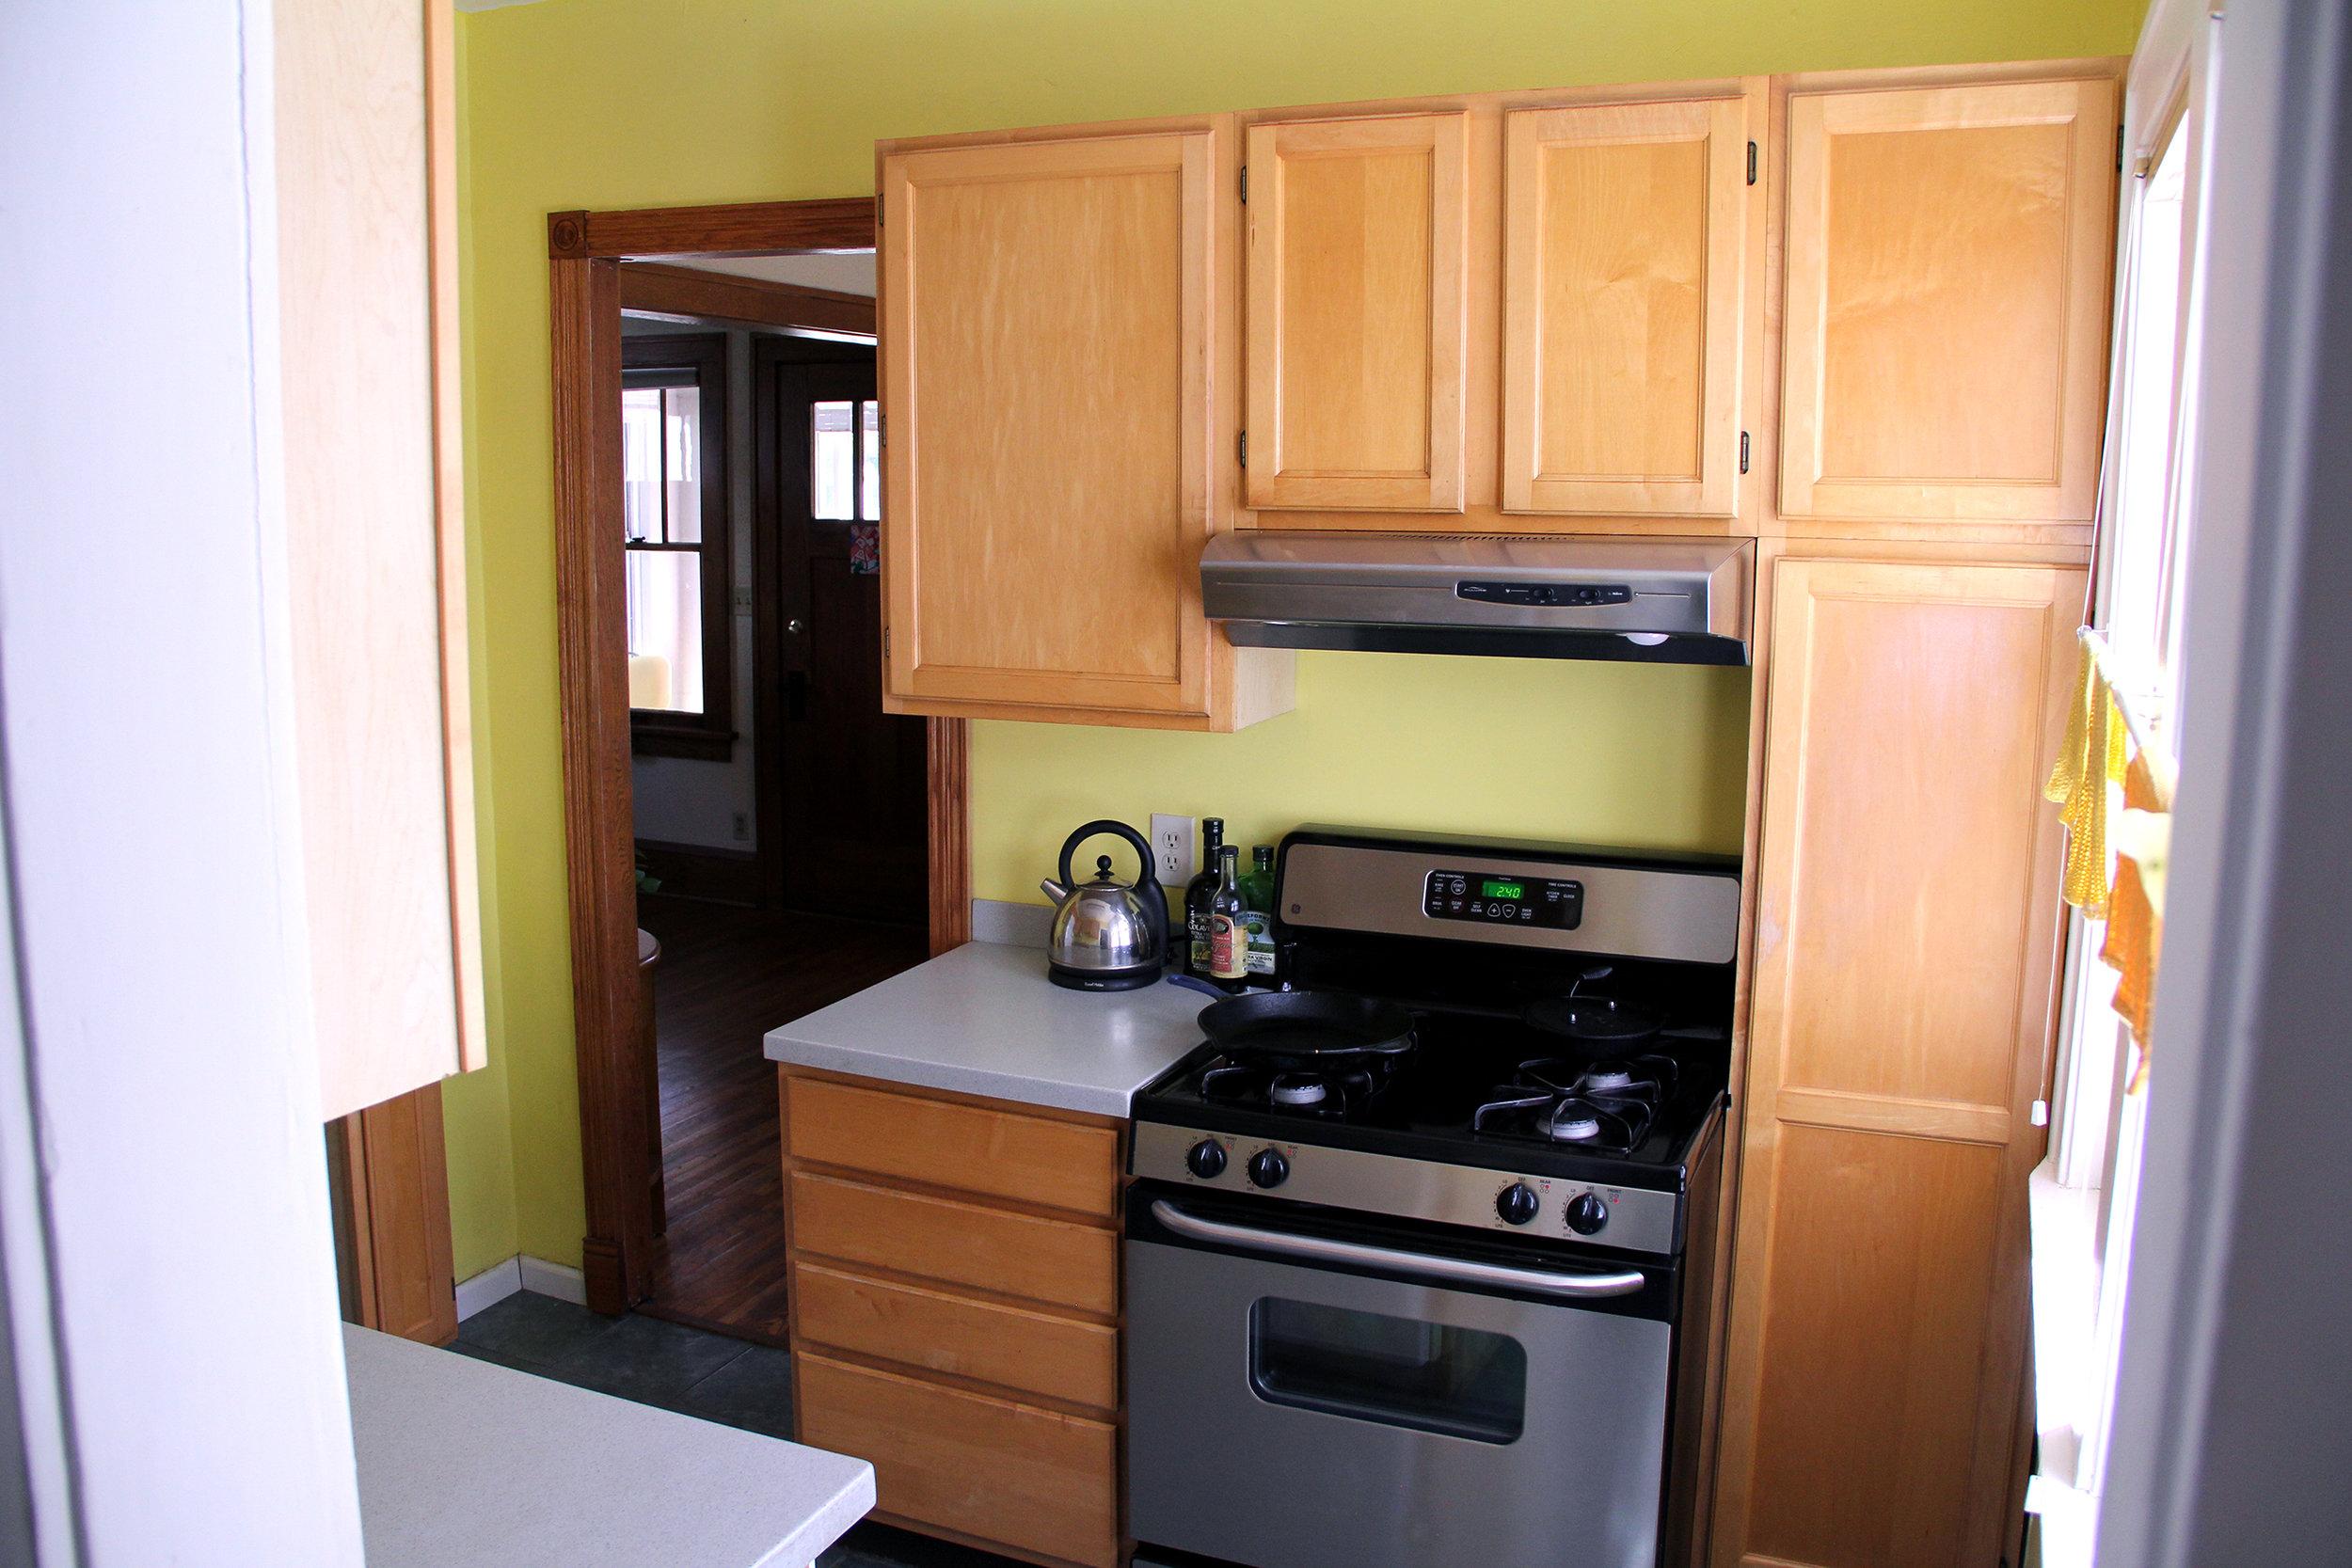 kitchen_27740774285_o.jpg